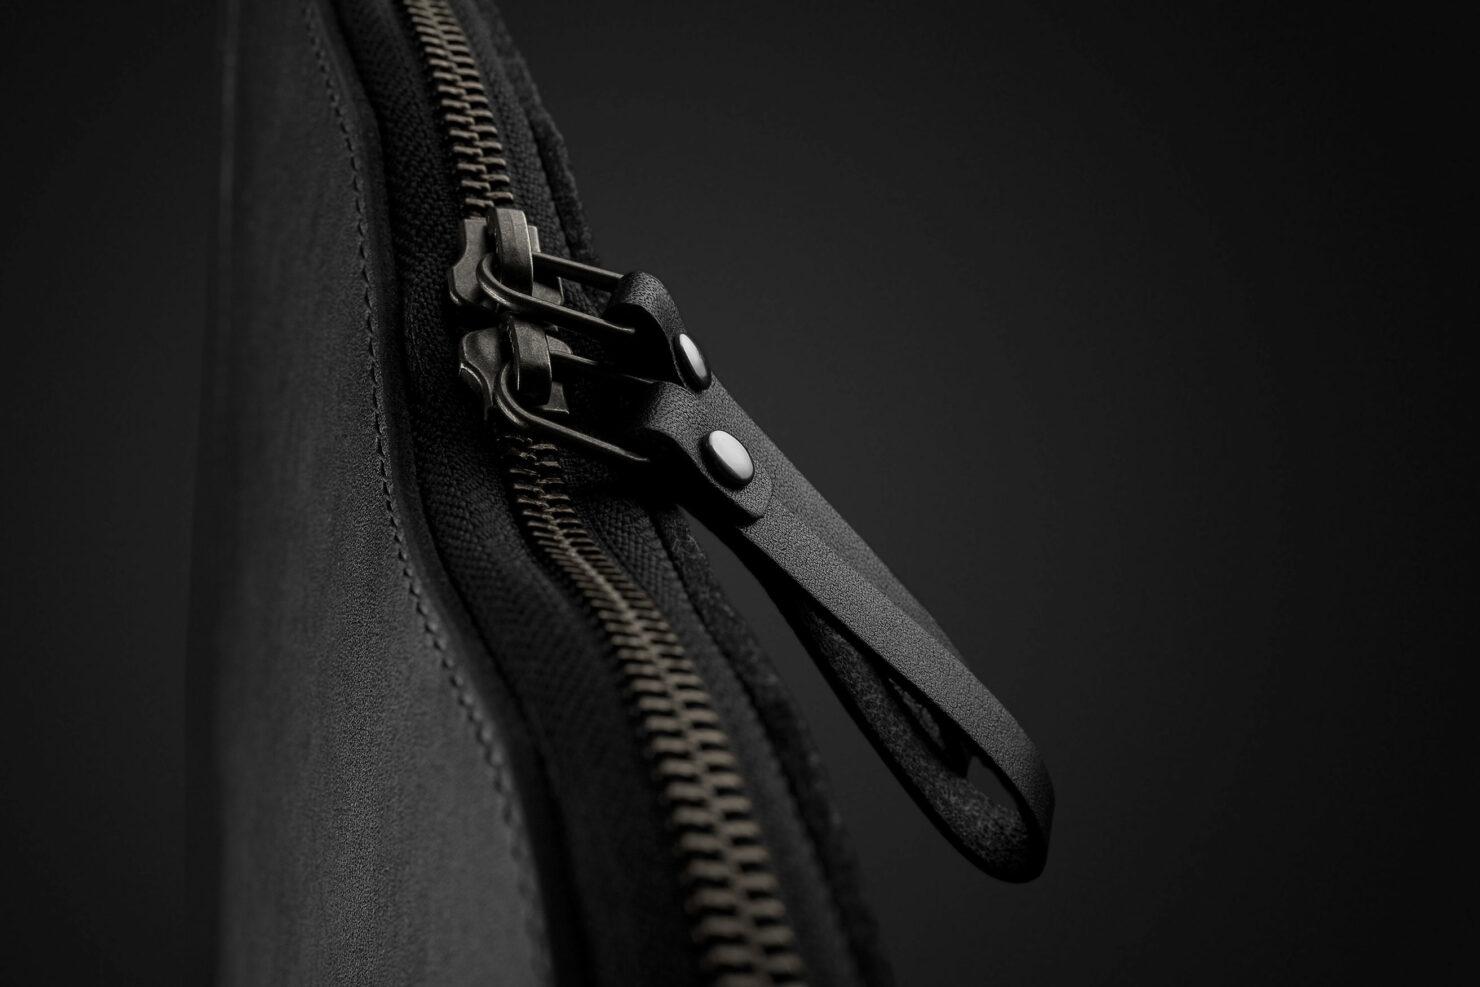 folio-sleeve-for-1322-macbook-air-pro-black-10